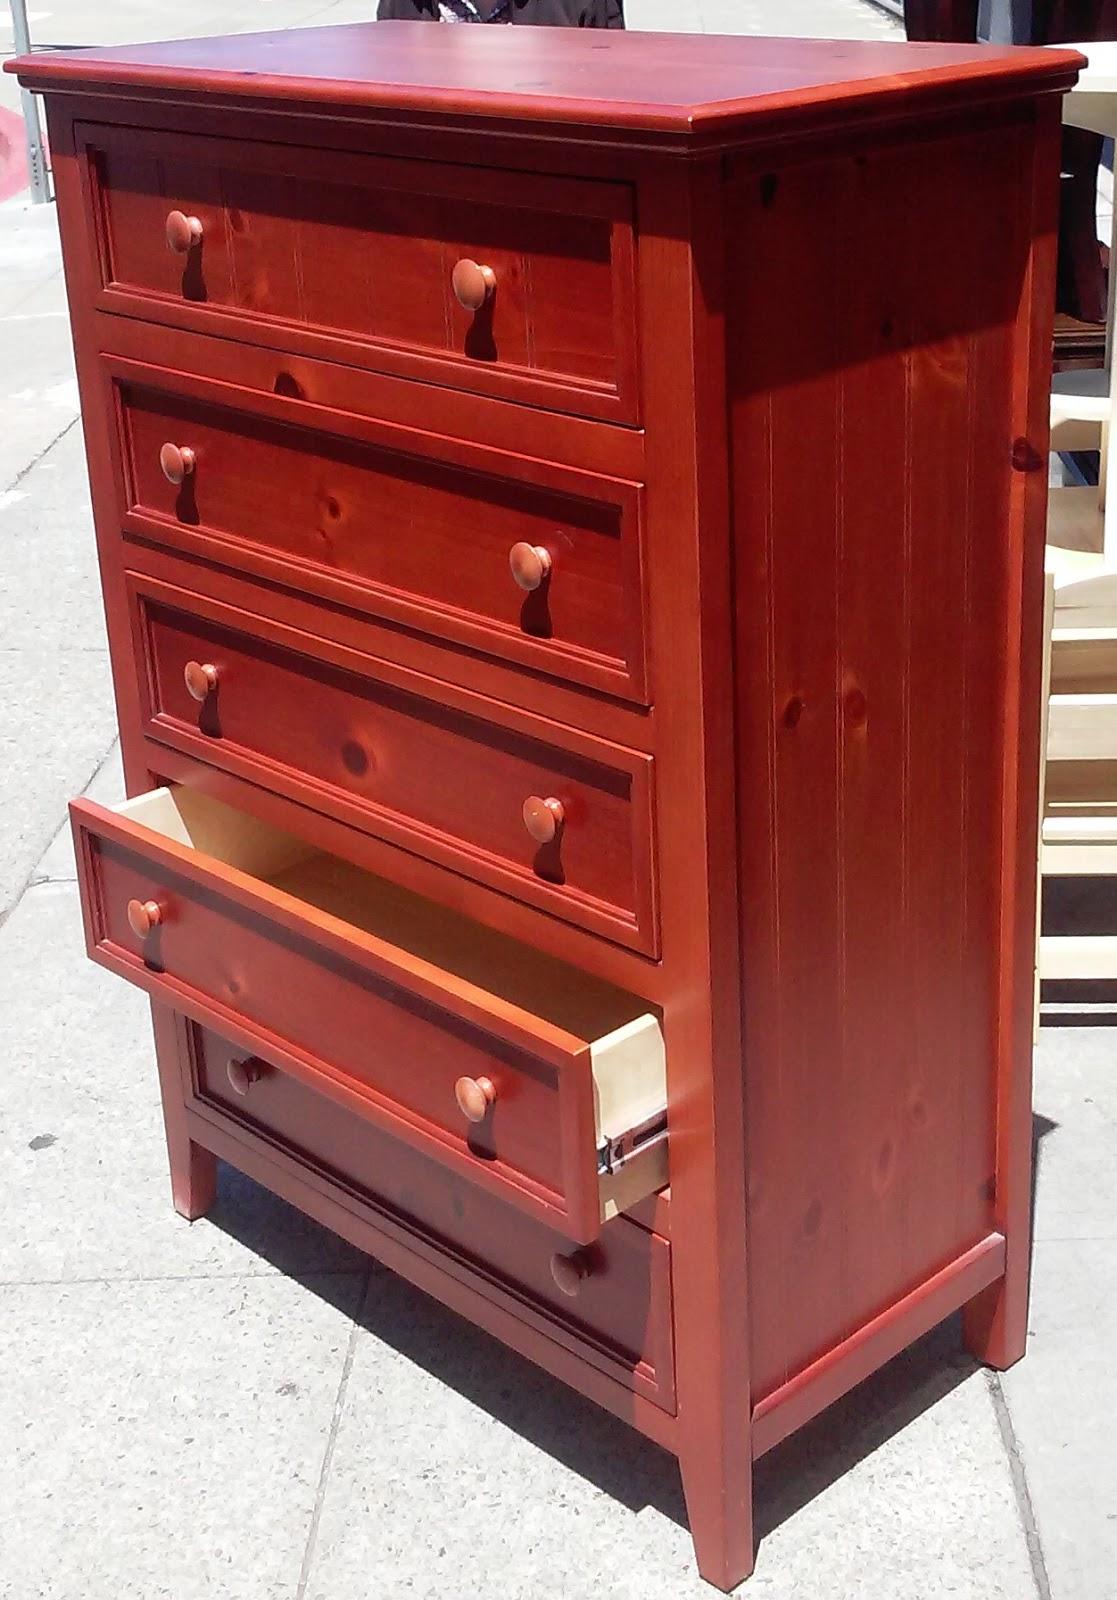 Uhuru Furniture Collectibles Sold 3699 Honey Pine 5 Drawer Chest 100